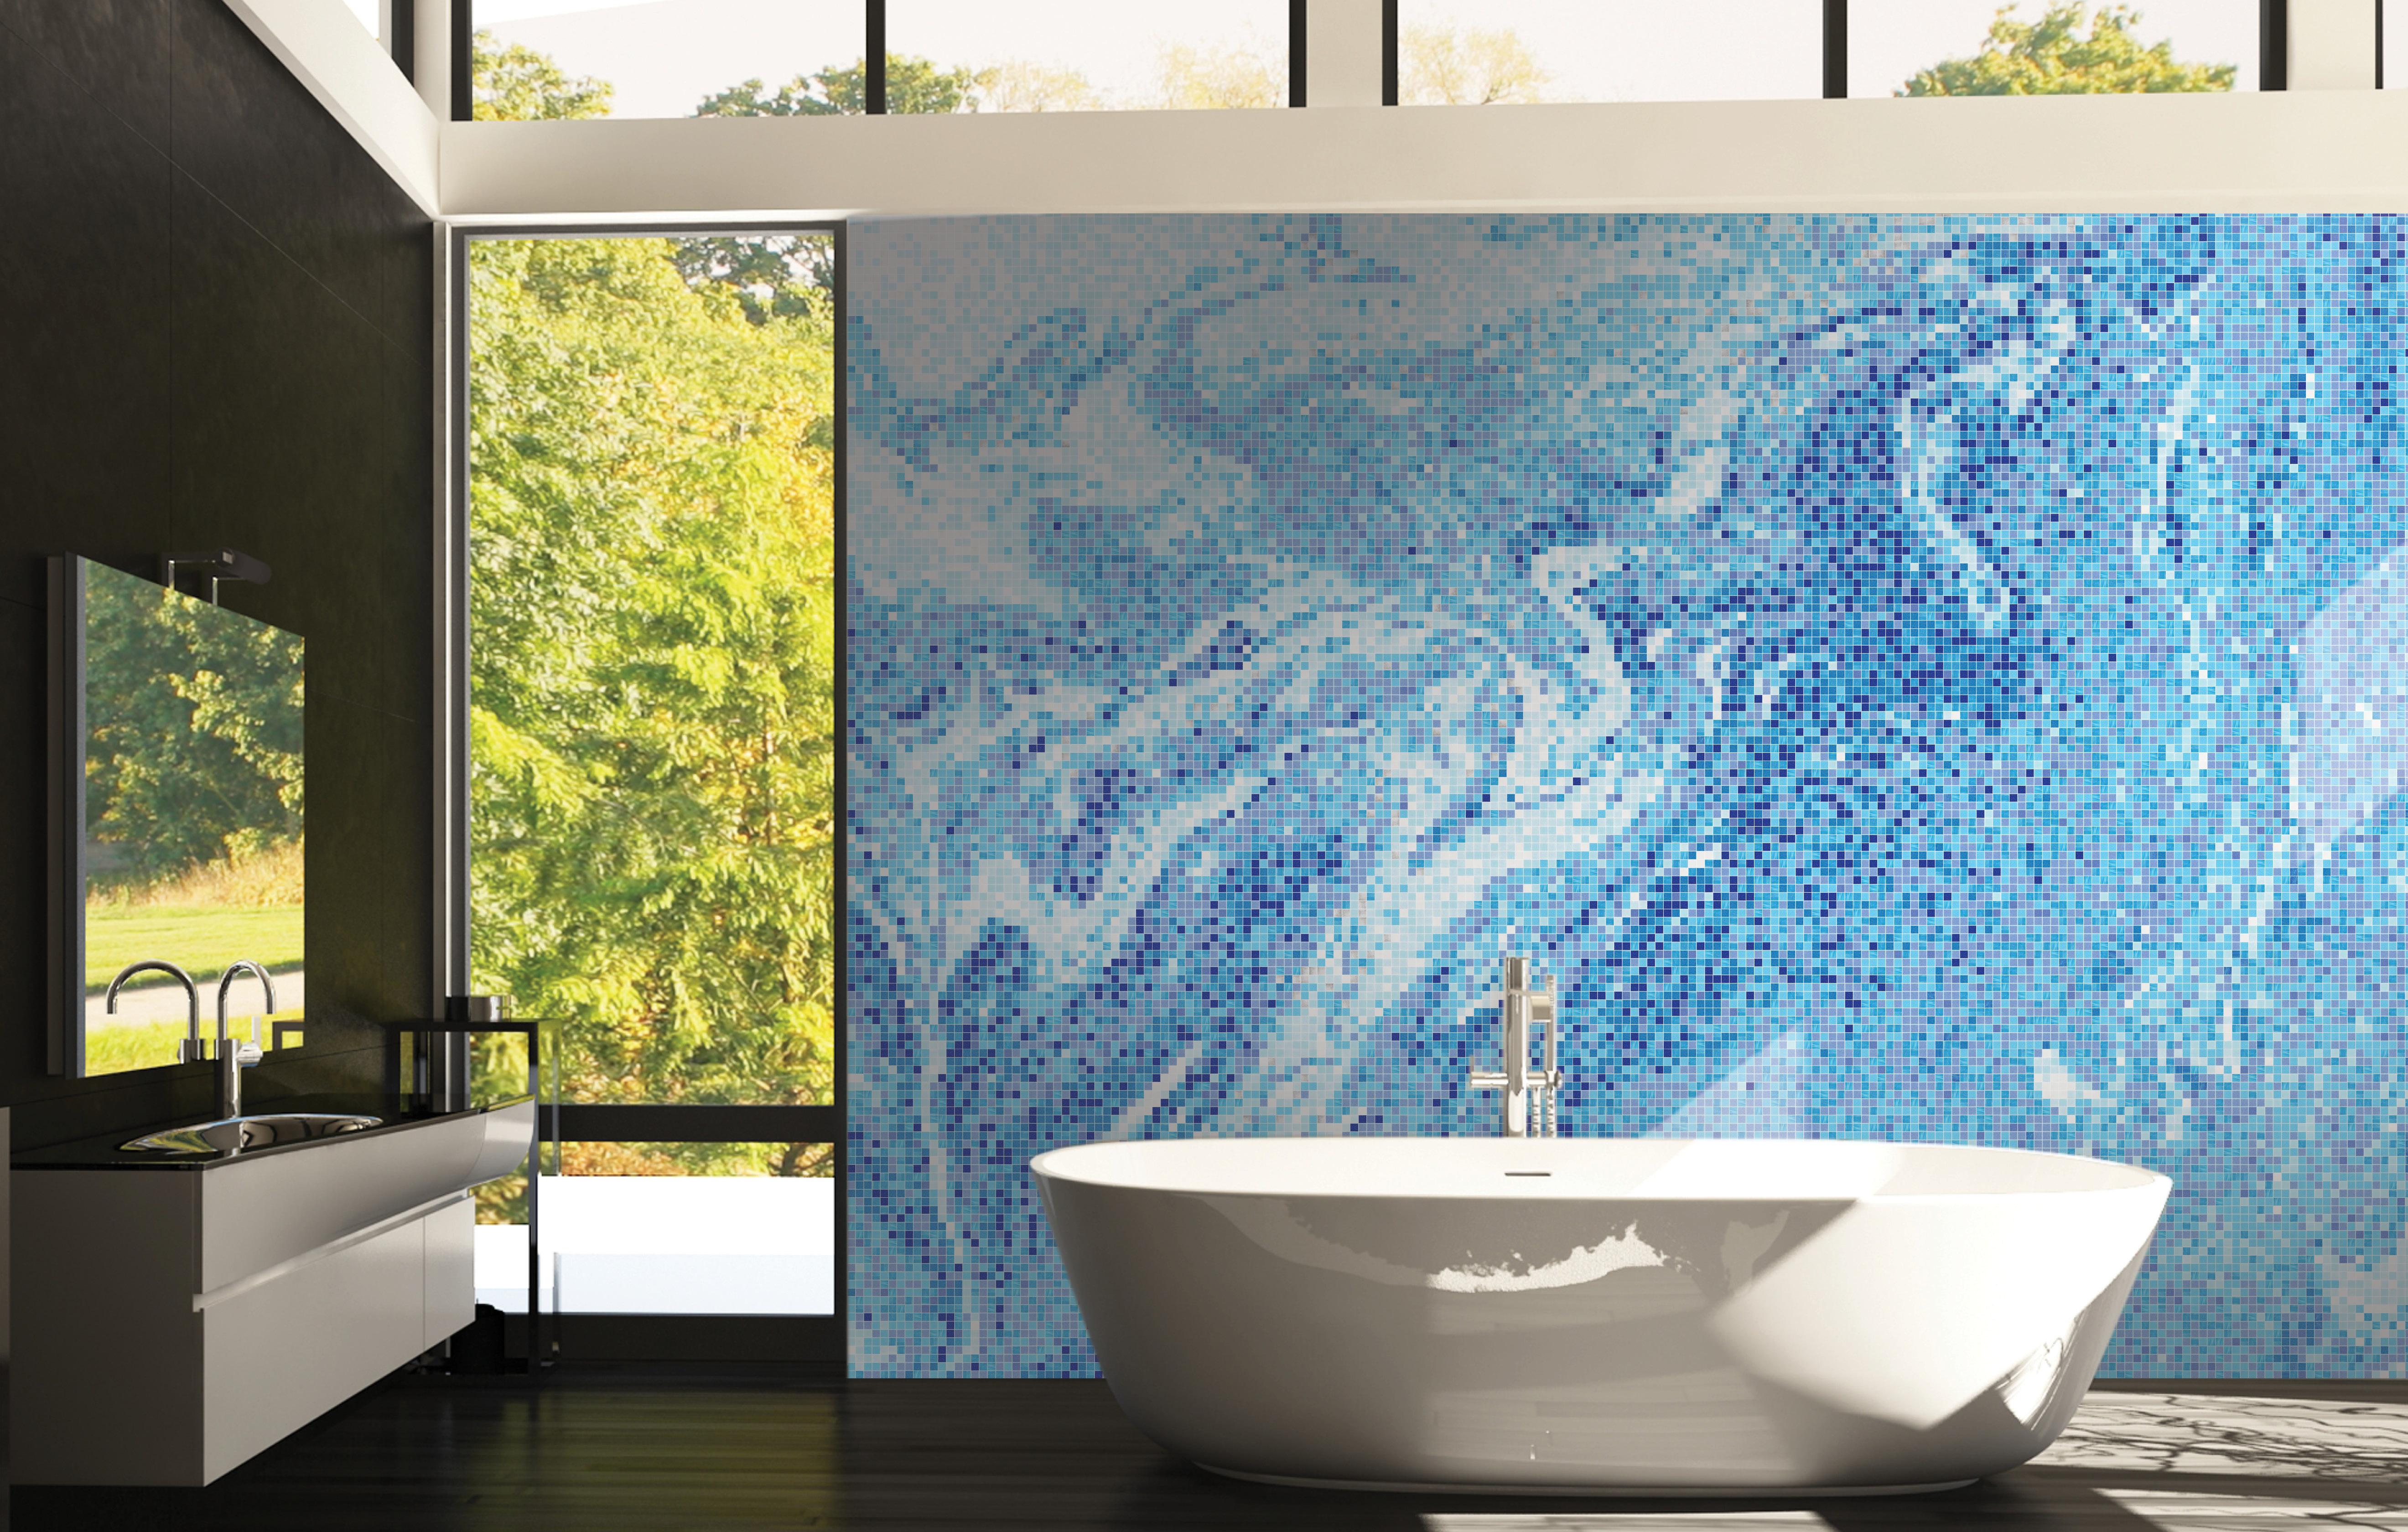 artaic-hotel-bathroom-blue-custom-mosaic-tile-pattern-0202001